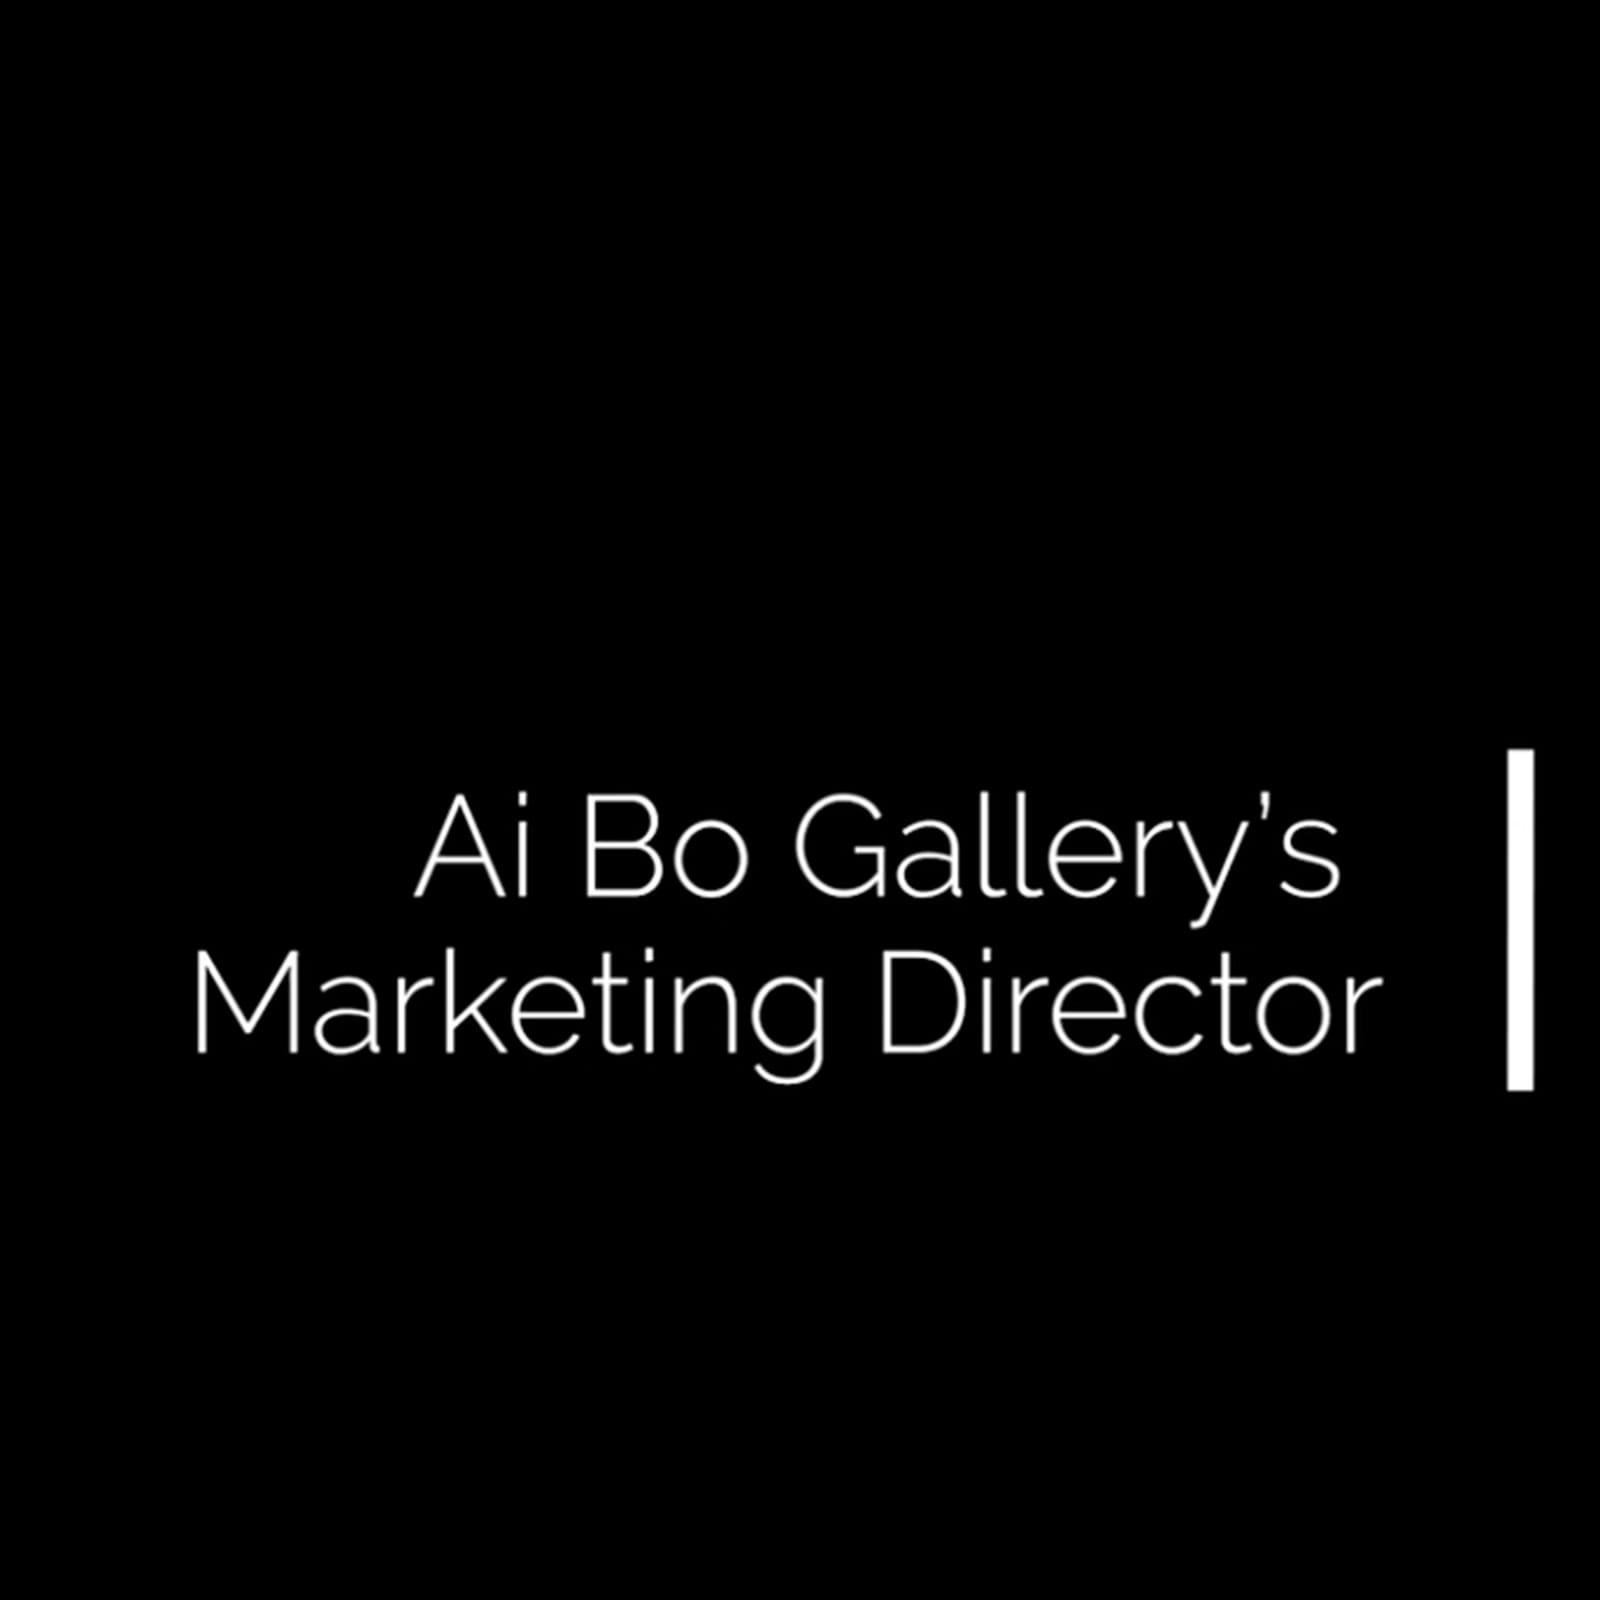 Ai Bo Gallery's Marketing Director